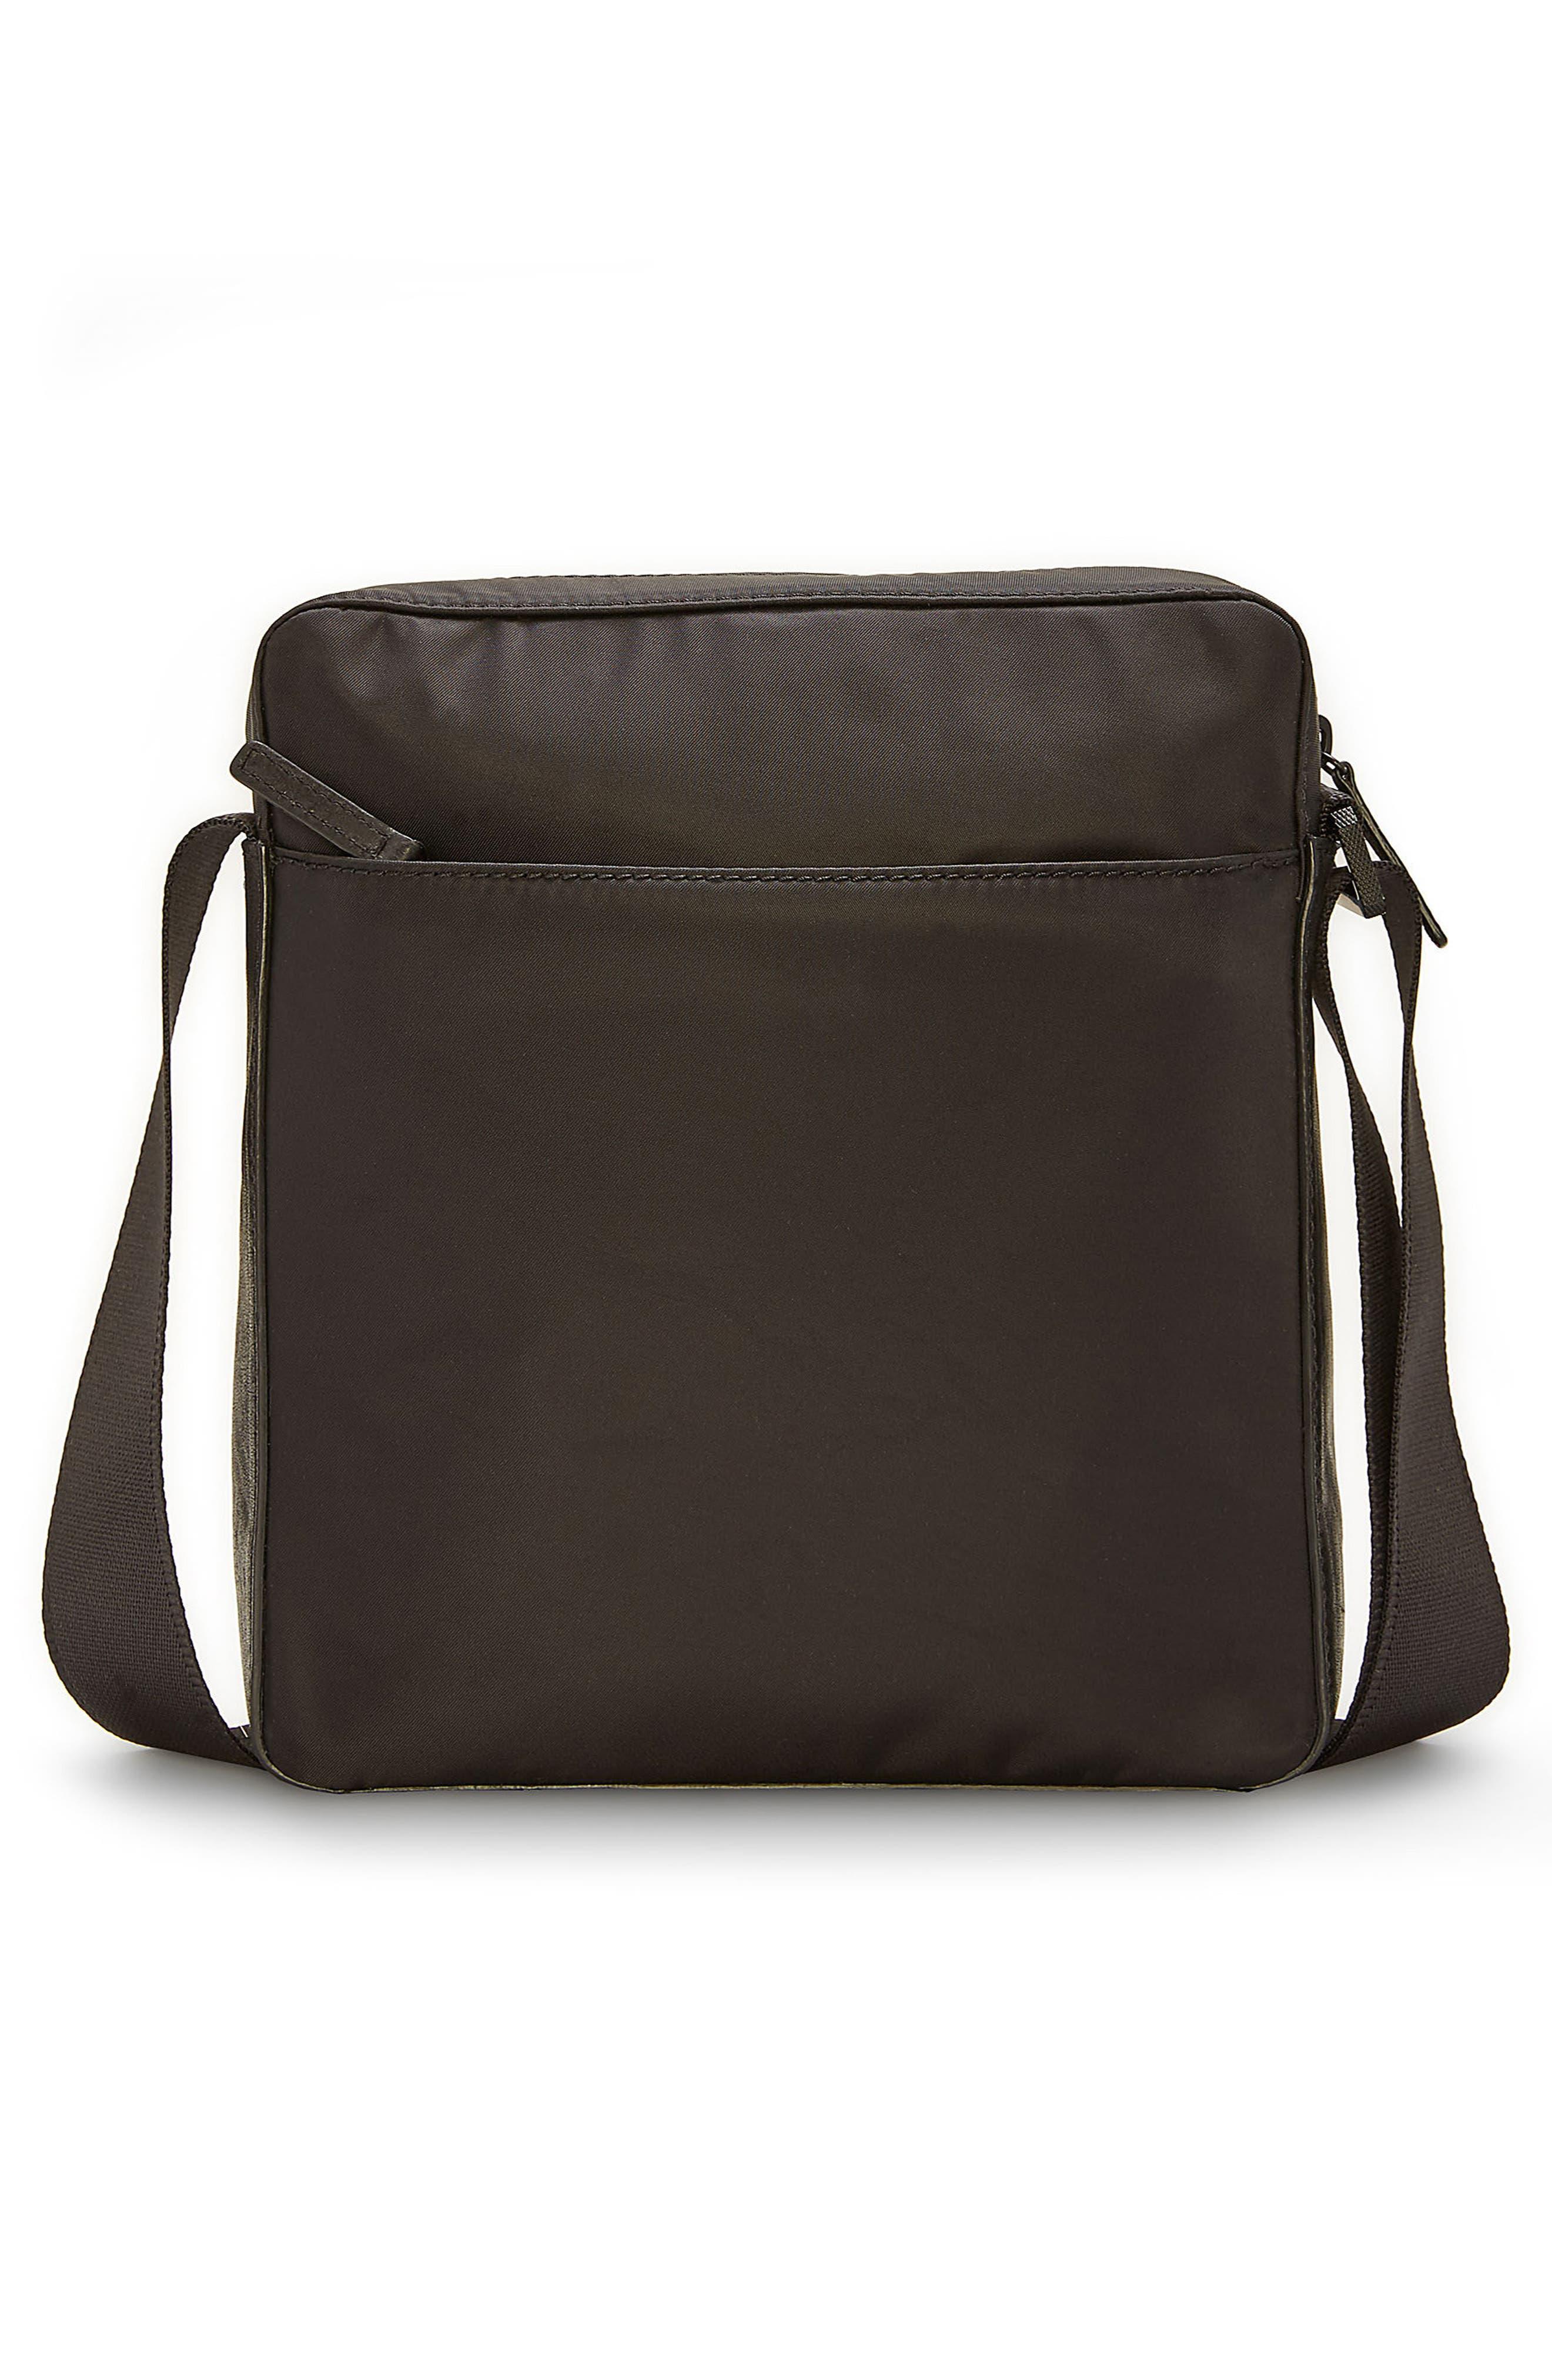 Basin Crossbody Bag,                             Alternate thumbnail 3, color,                             Black